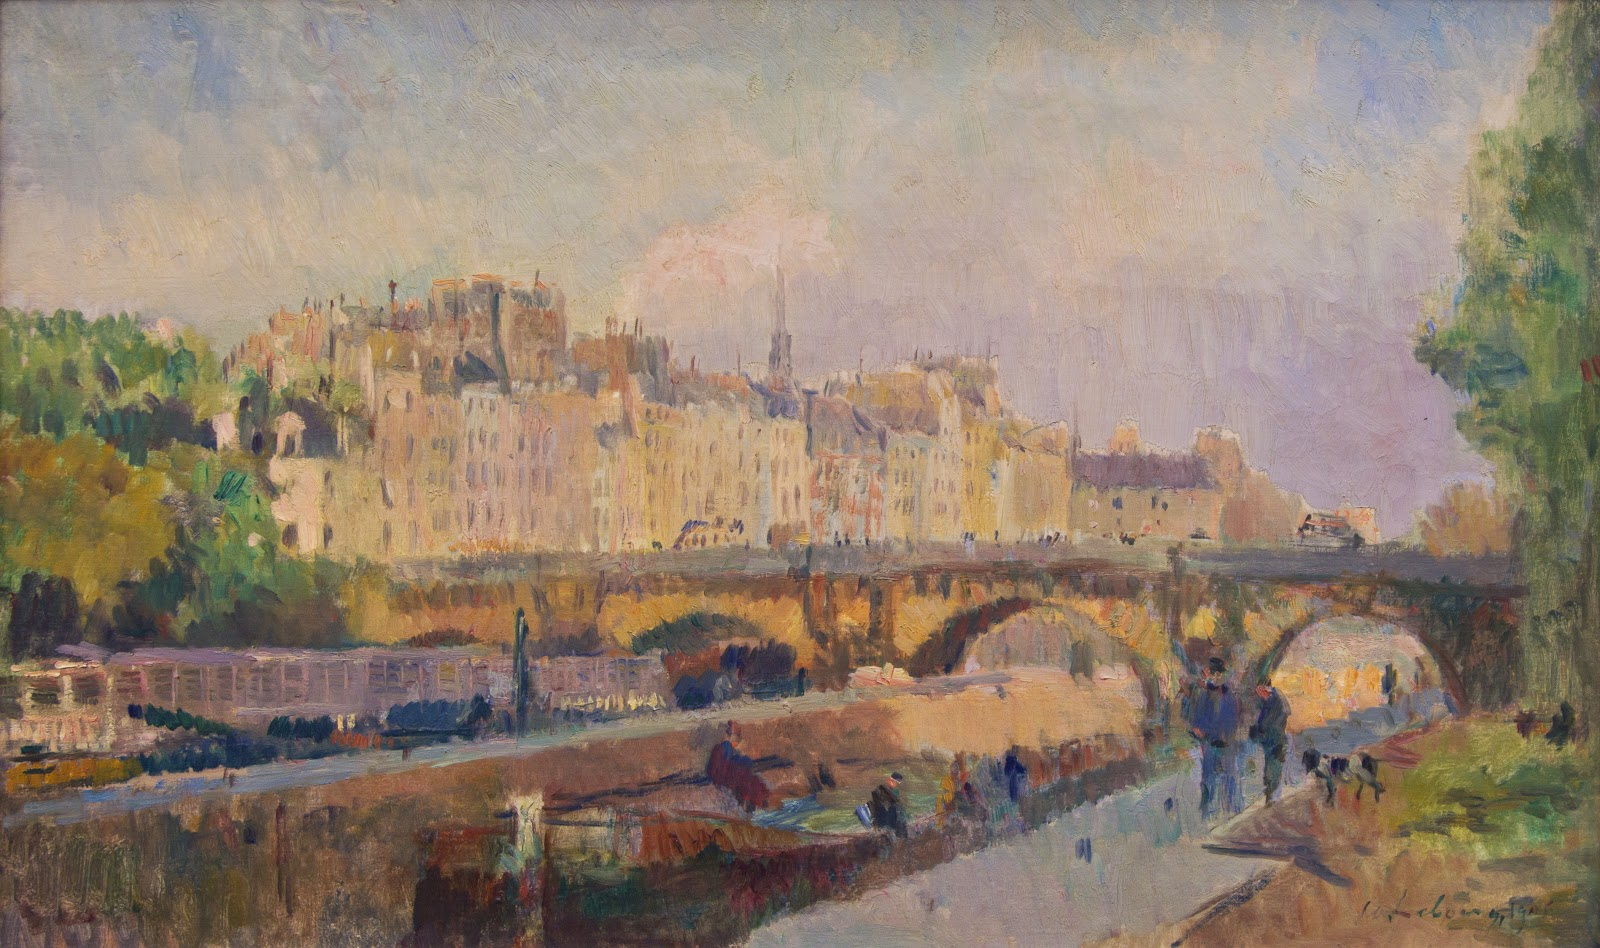 Картинки по запросу gicléedruk: le pont-neuf by albert lebourg, 61x41cm.